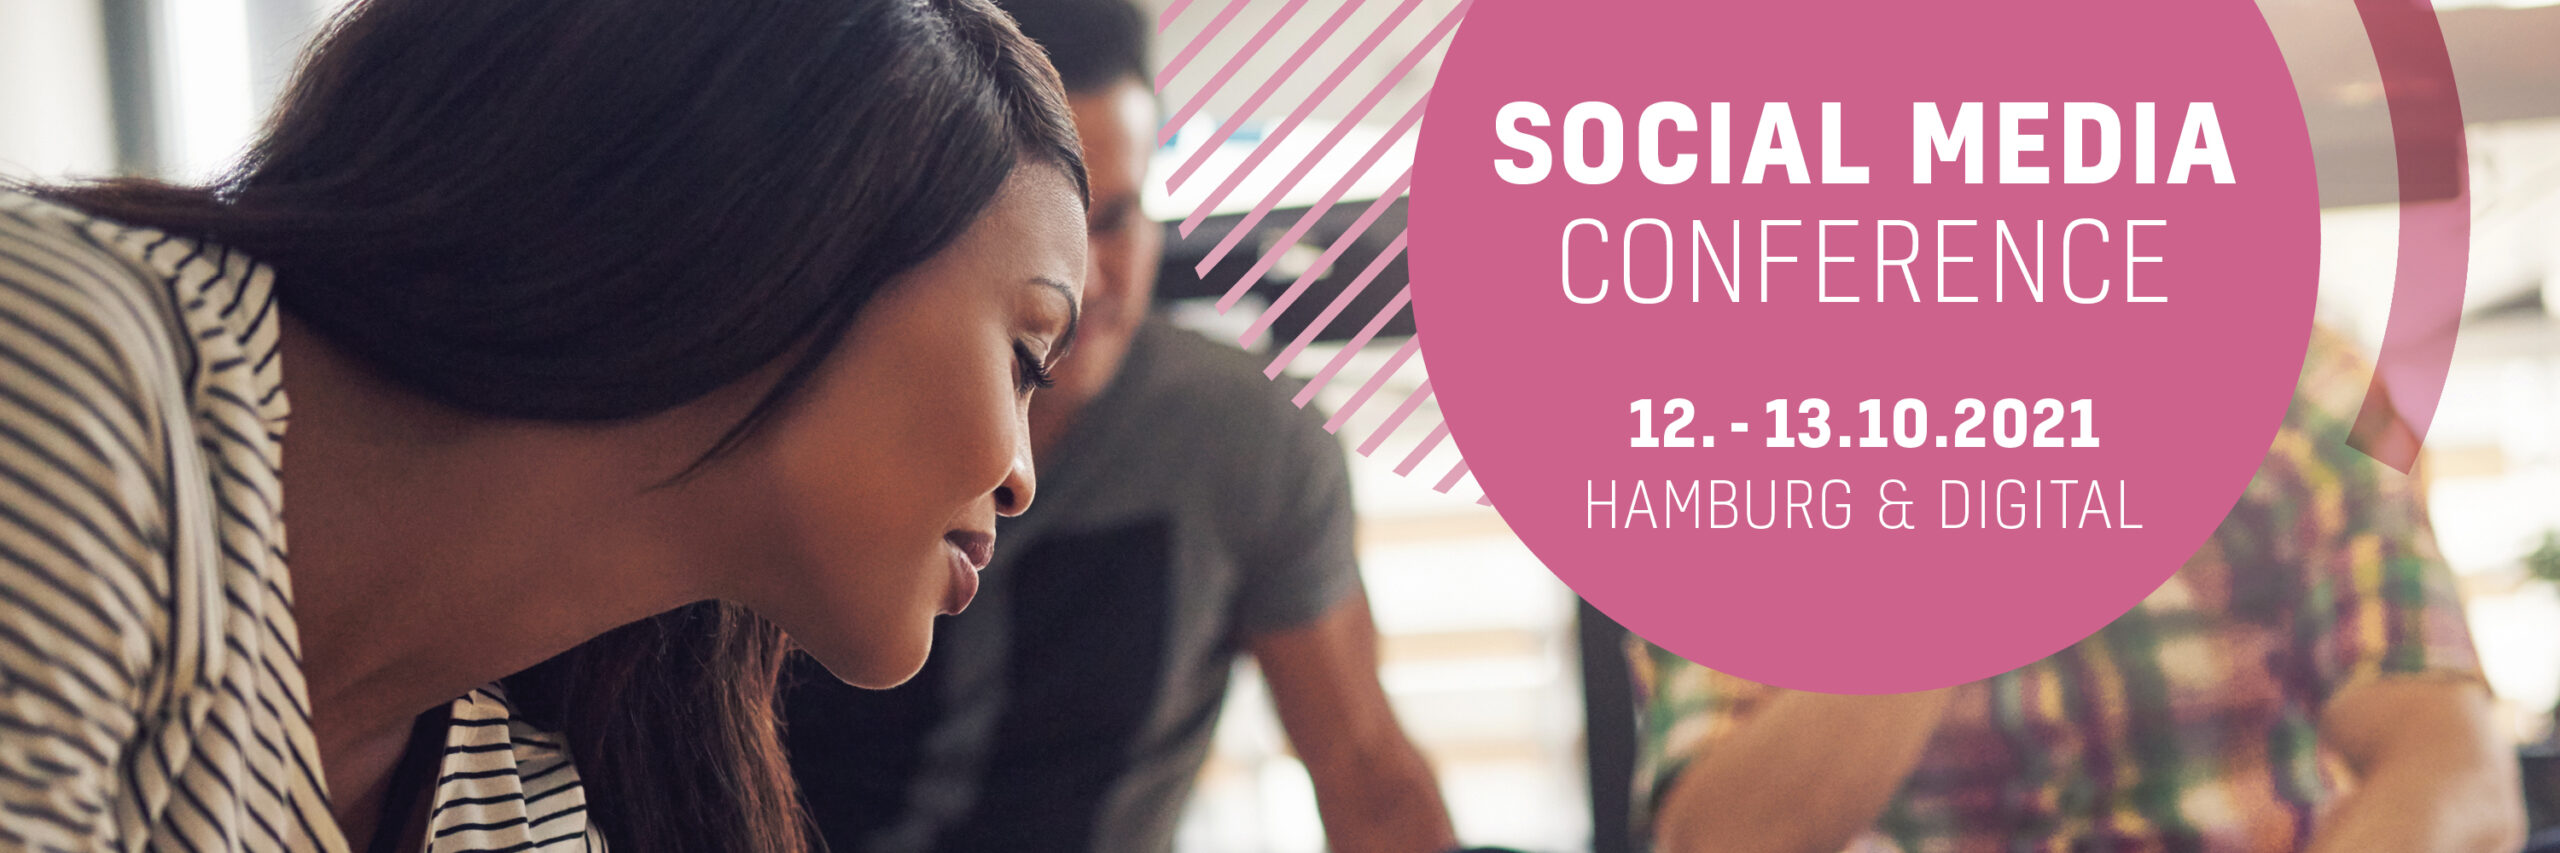 socia-media-conference-hamburg-2021